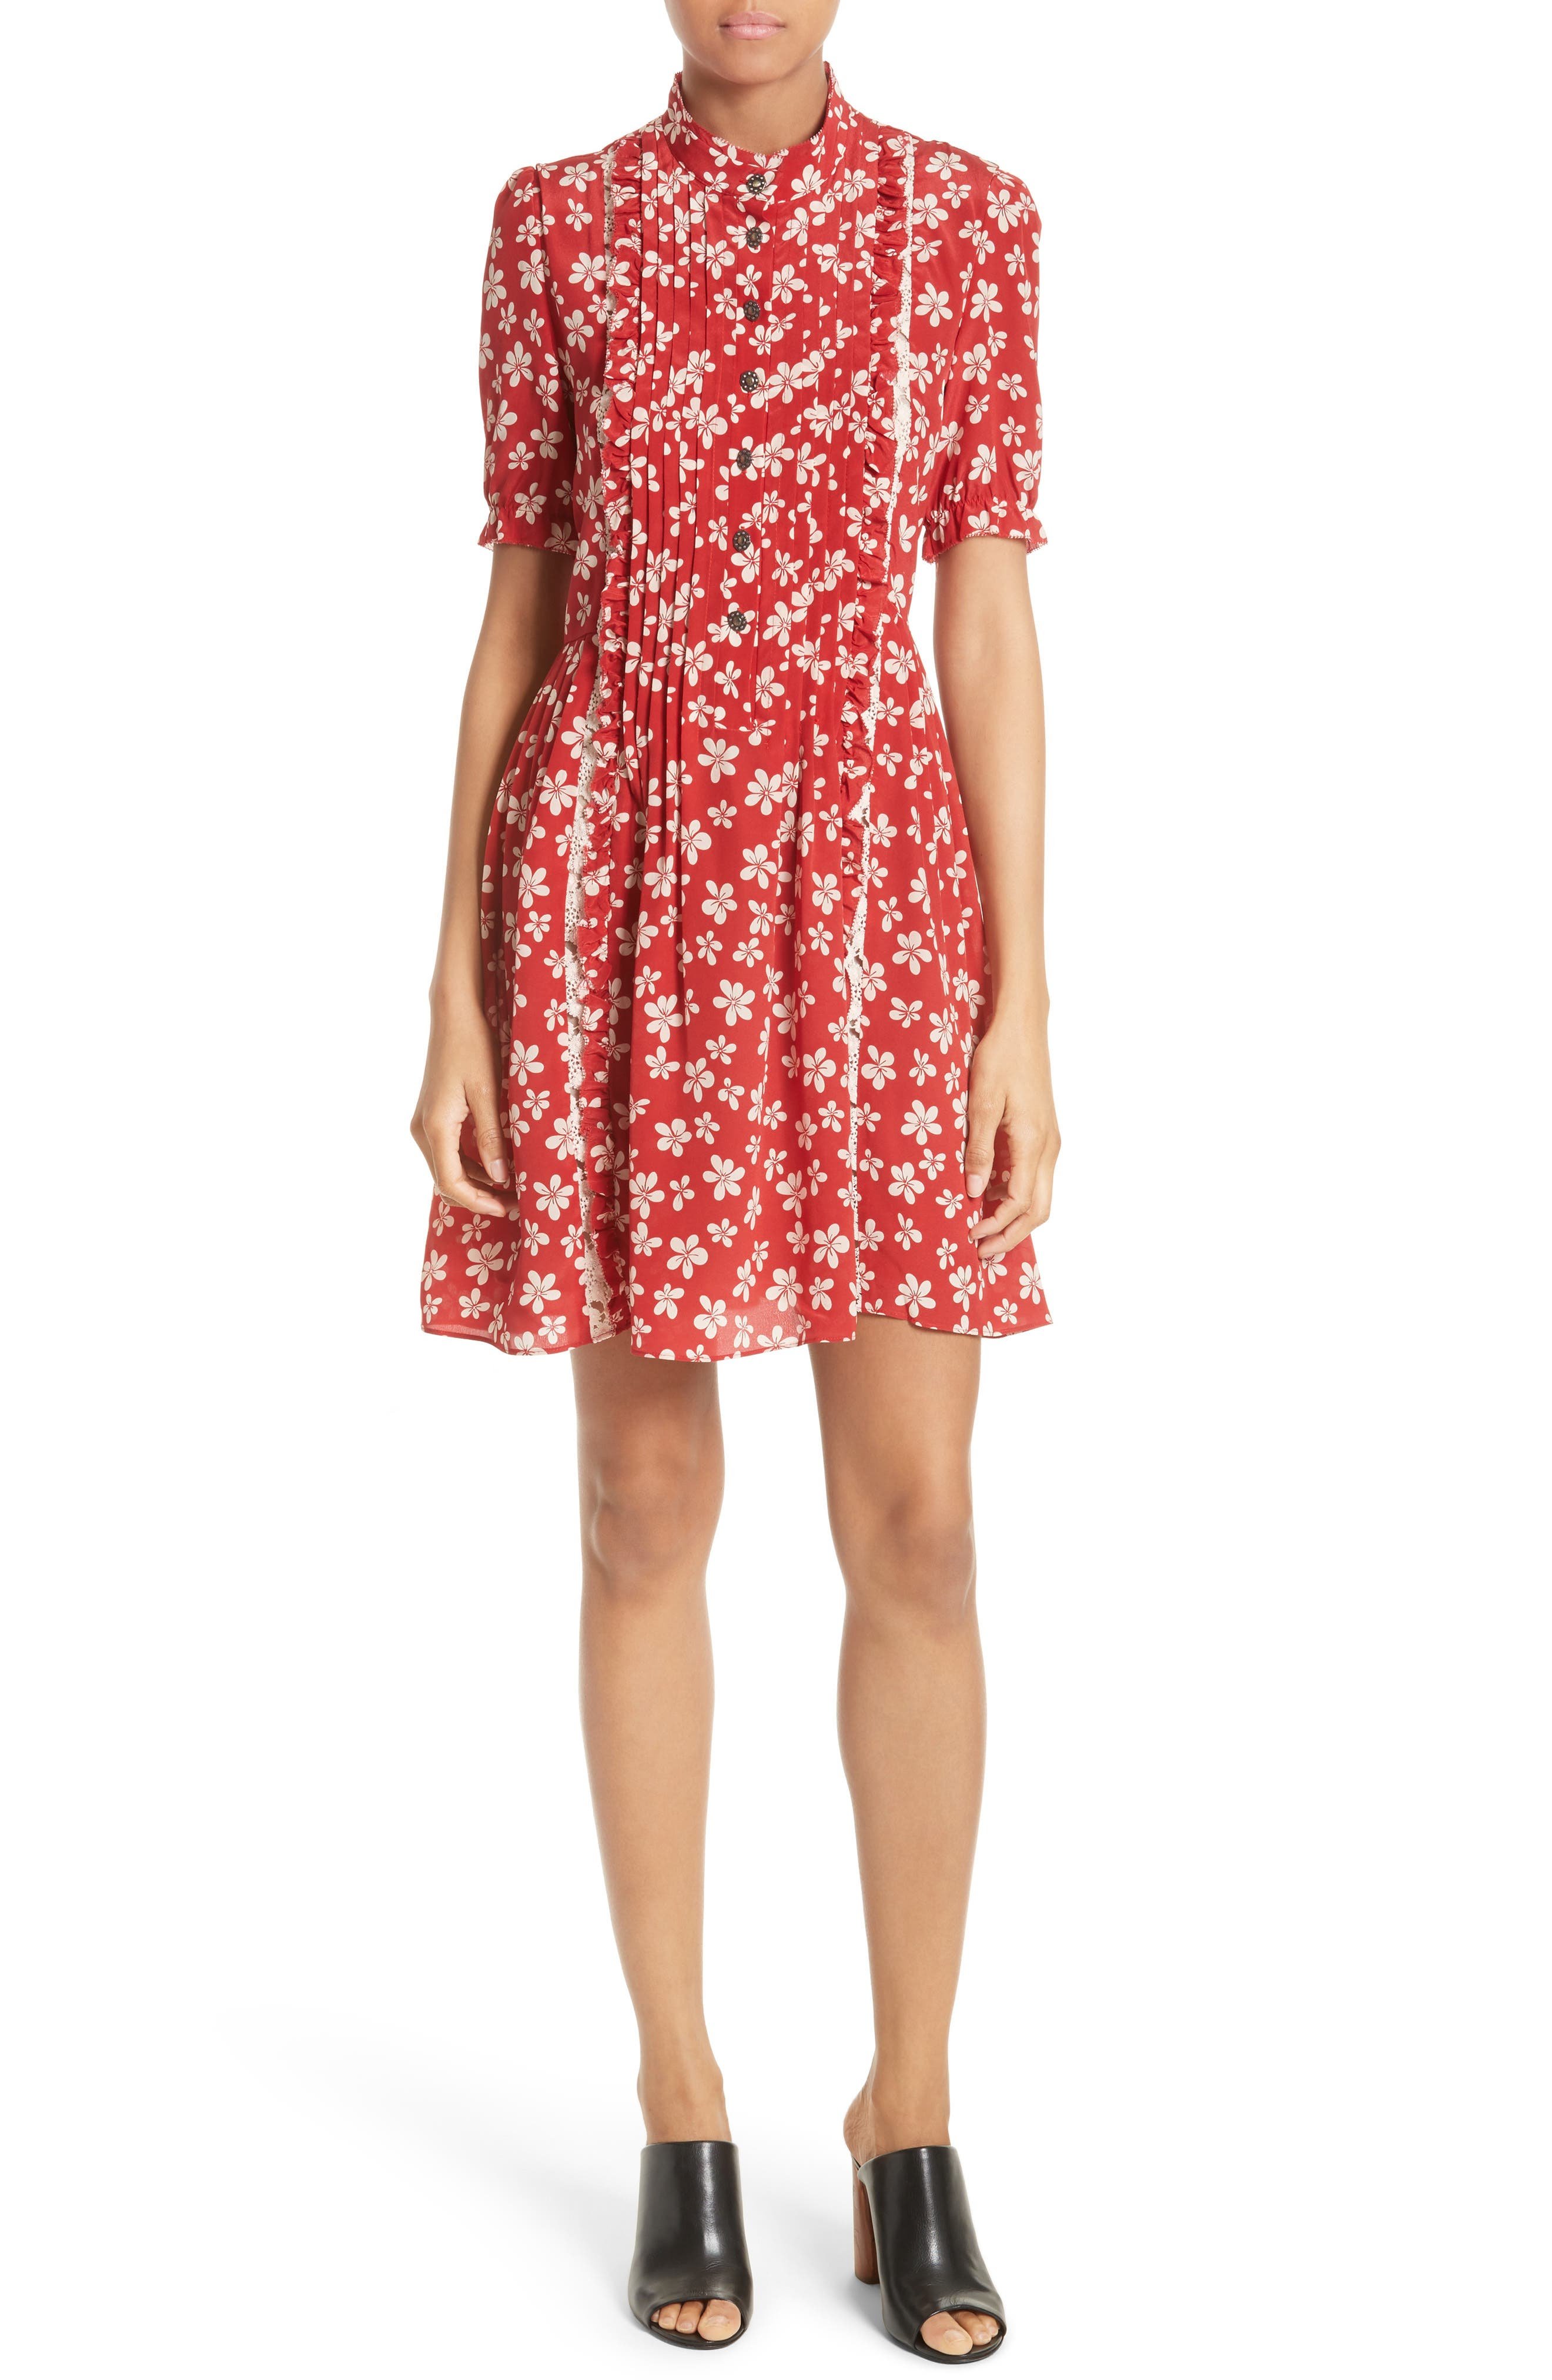 Alternate Image 1 Selected - The Kooples Floral Print Silk Dress